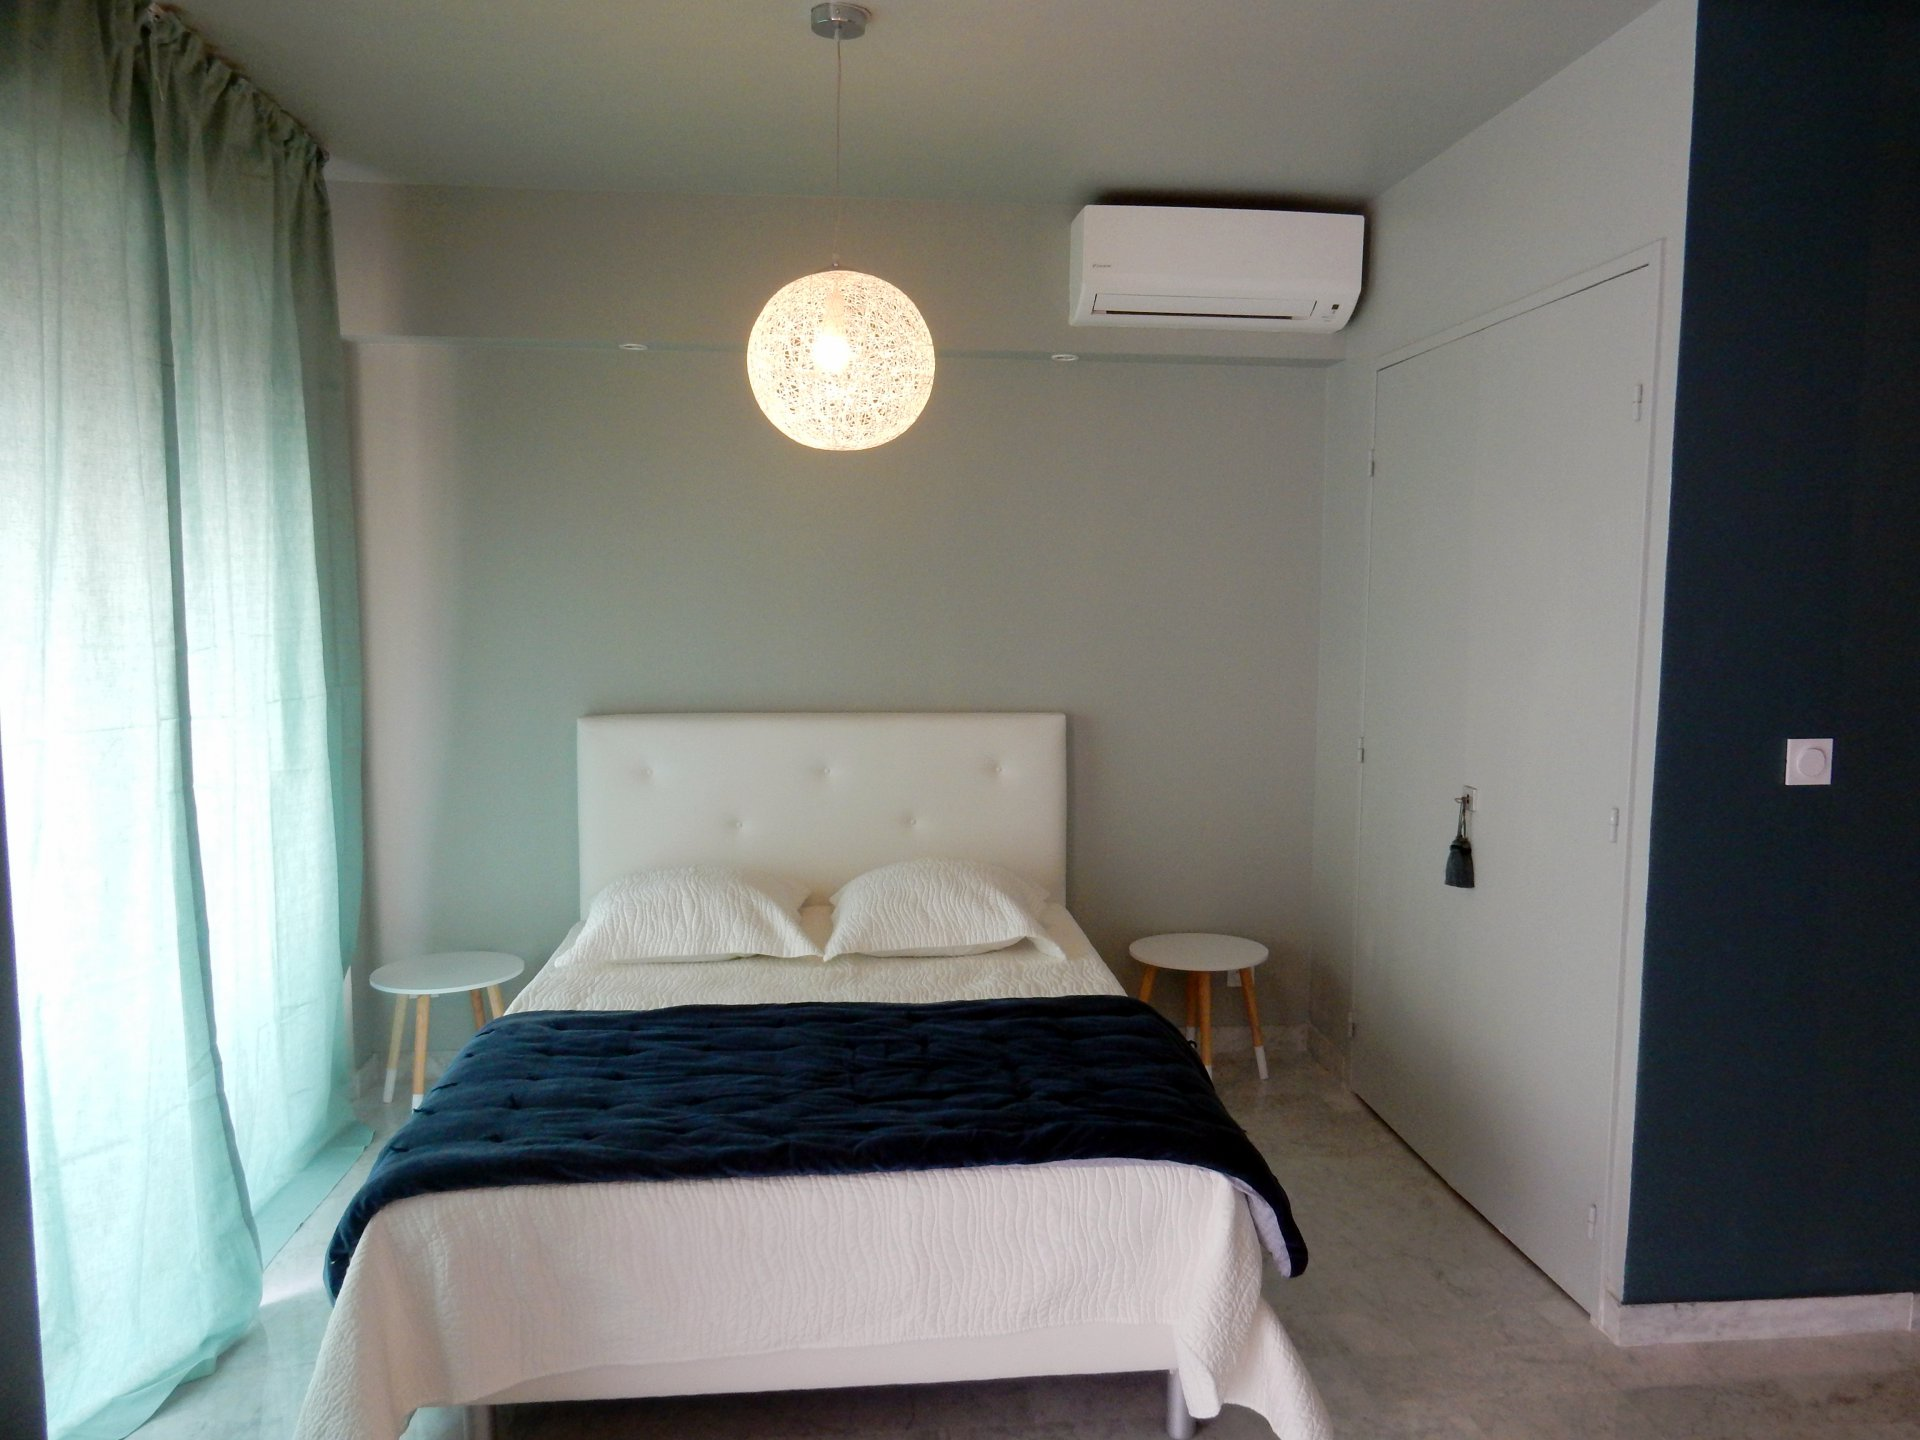 location Nice appartement 2P meublé rénové quartier bas Sainte Marguerite proche promenade